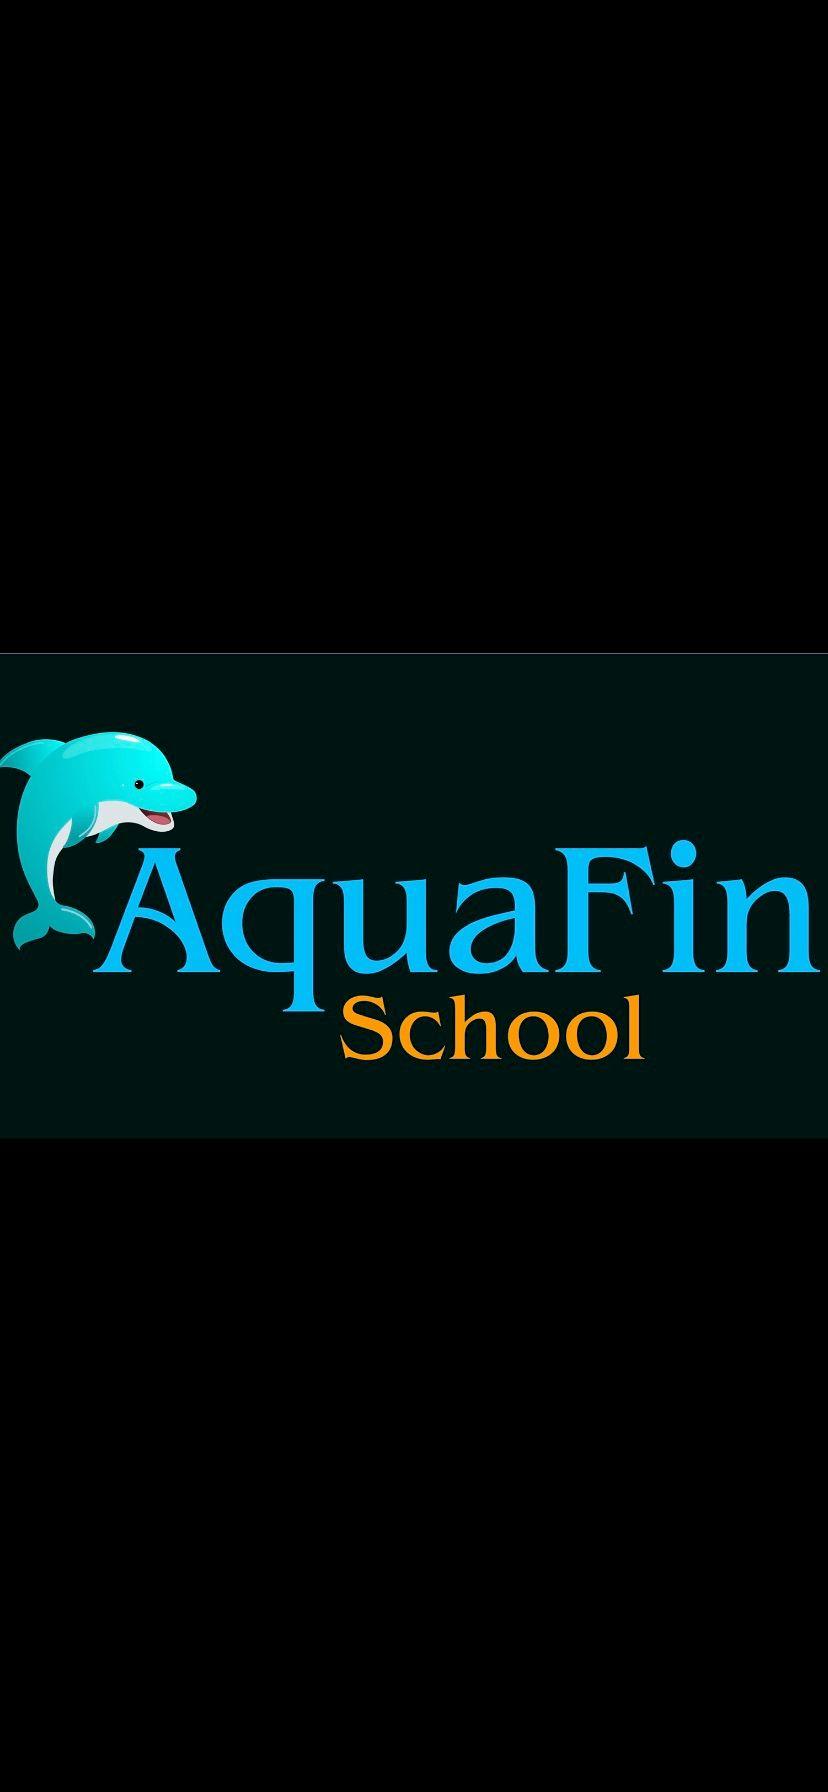 AquaFin School